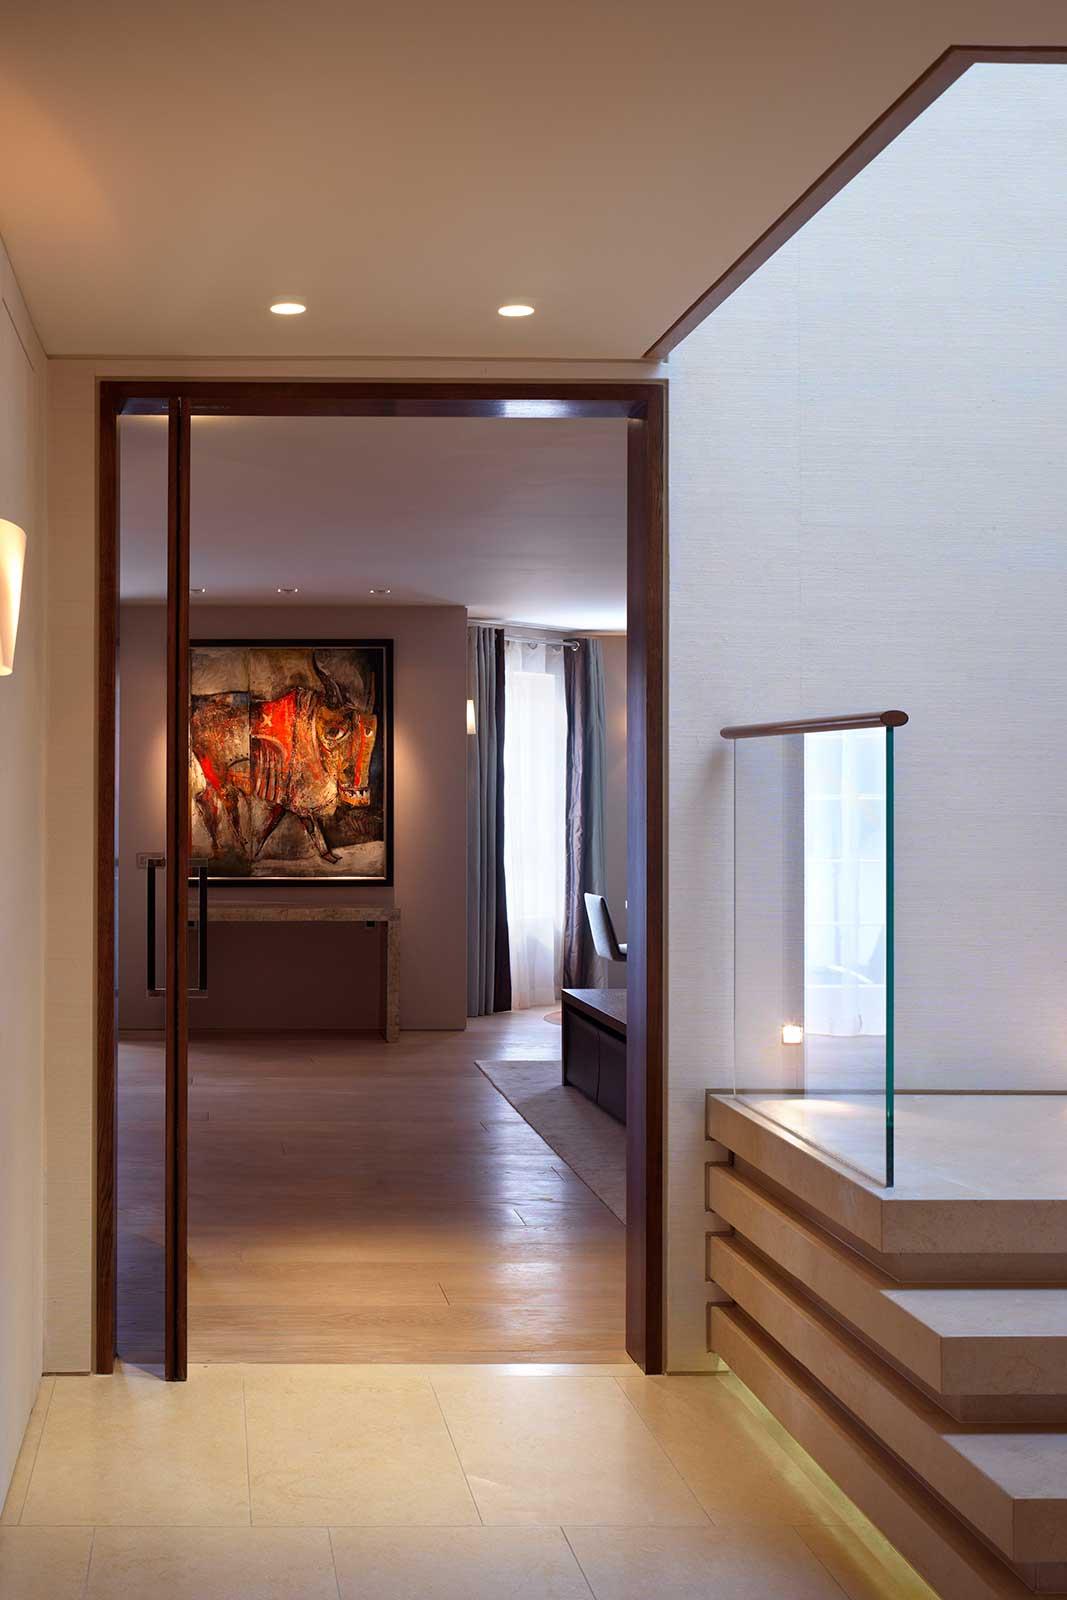 Bespoke Glass Balustrade and Doors